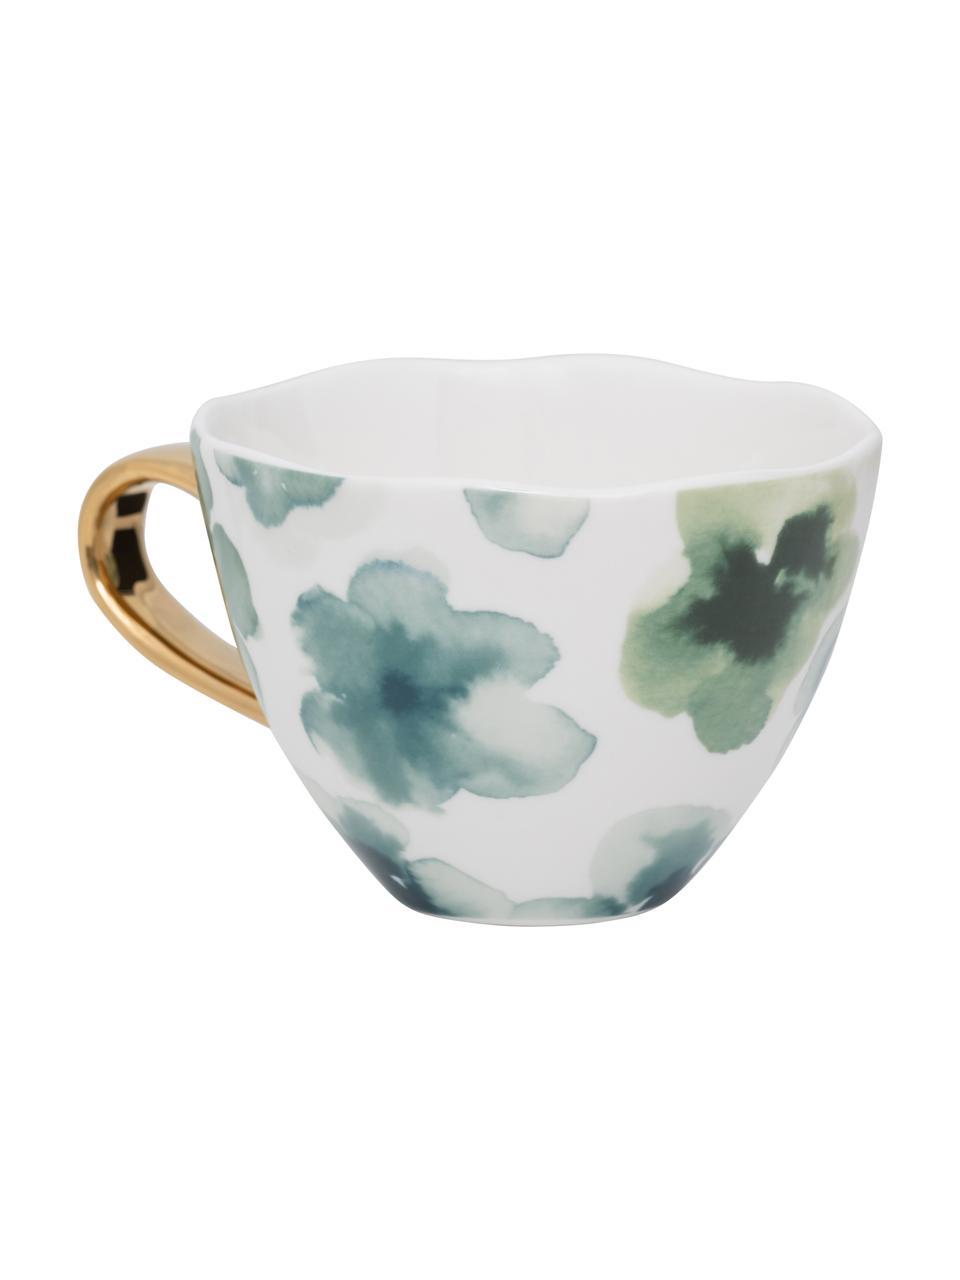 Tasse Good Morning, bunt bemalt mit goldfarbenem Griff, New Bone China, Weiß, Grün, Blau, Goldfarben, Ø 11 x H 8 cm